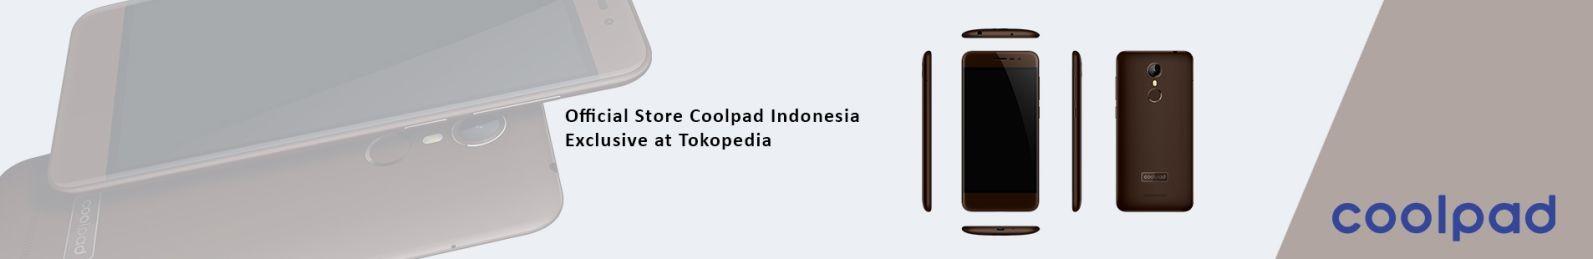 Coolpad Indonesia